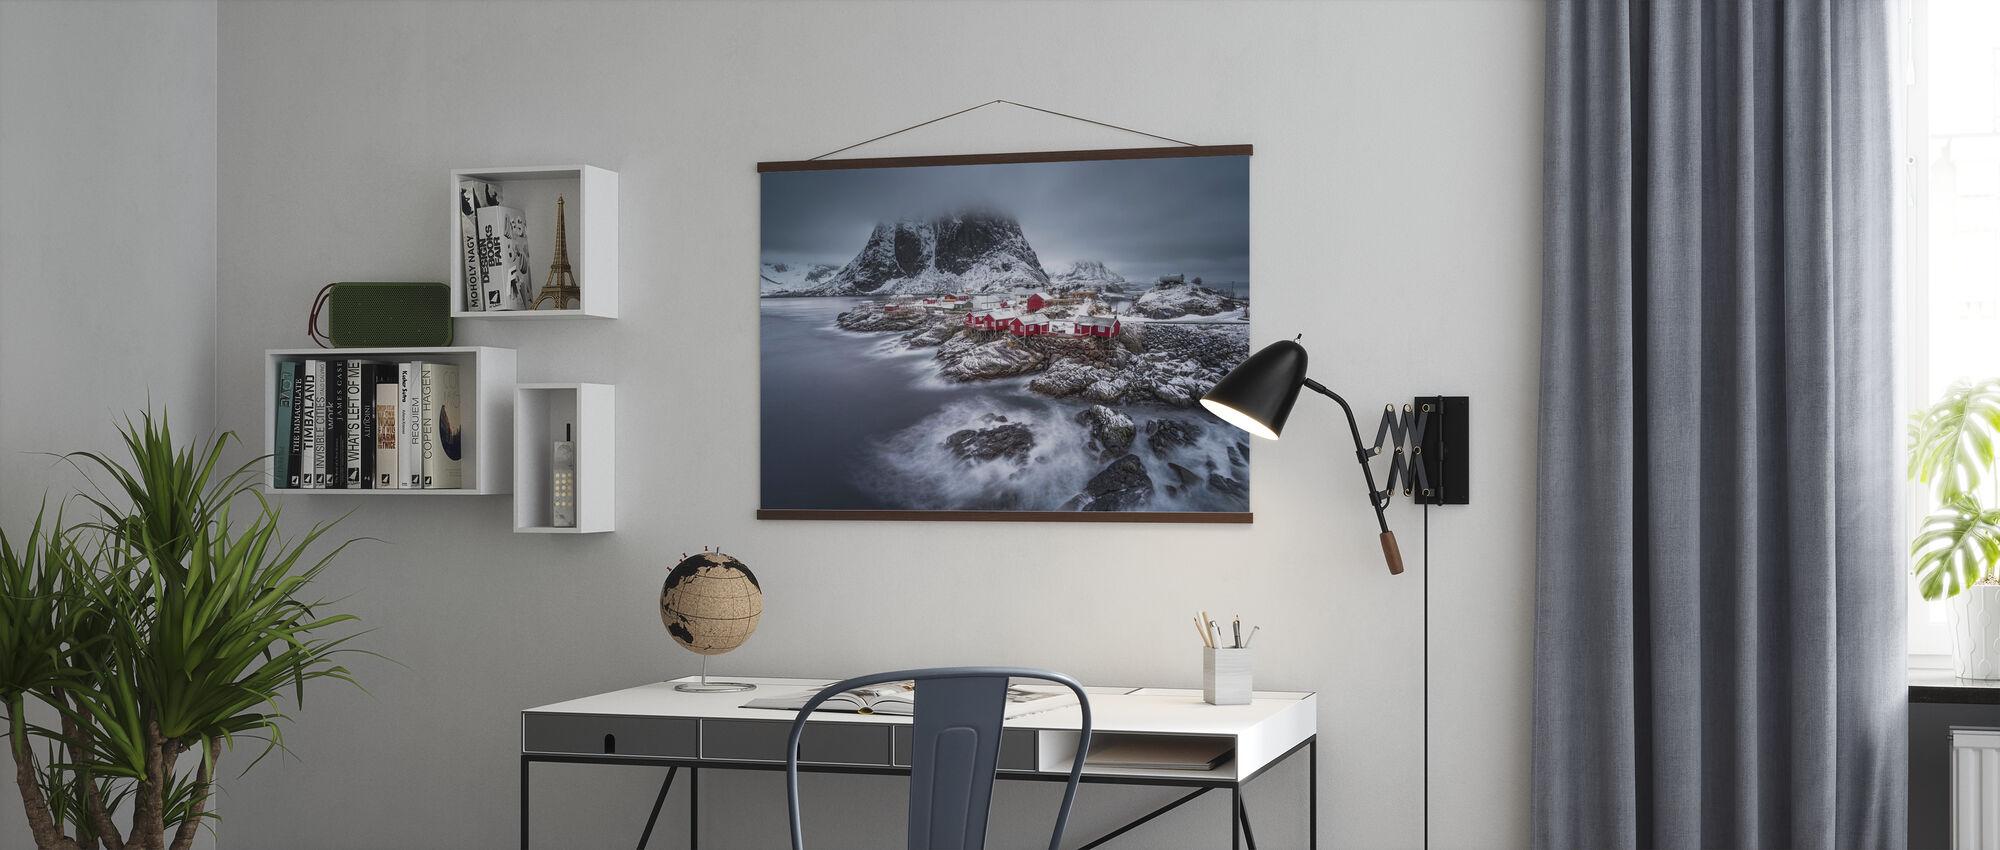 Winter Lofoten Islands - Poster - Büro